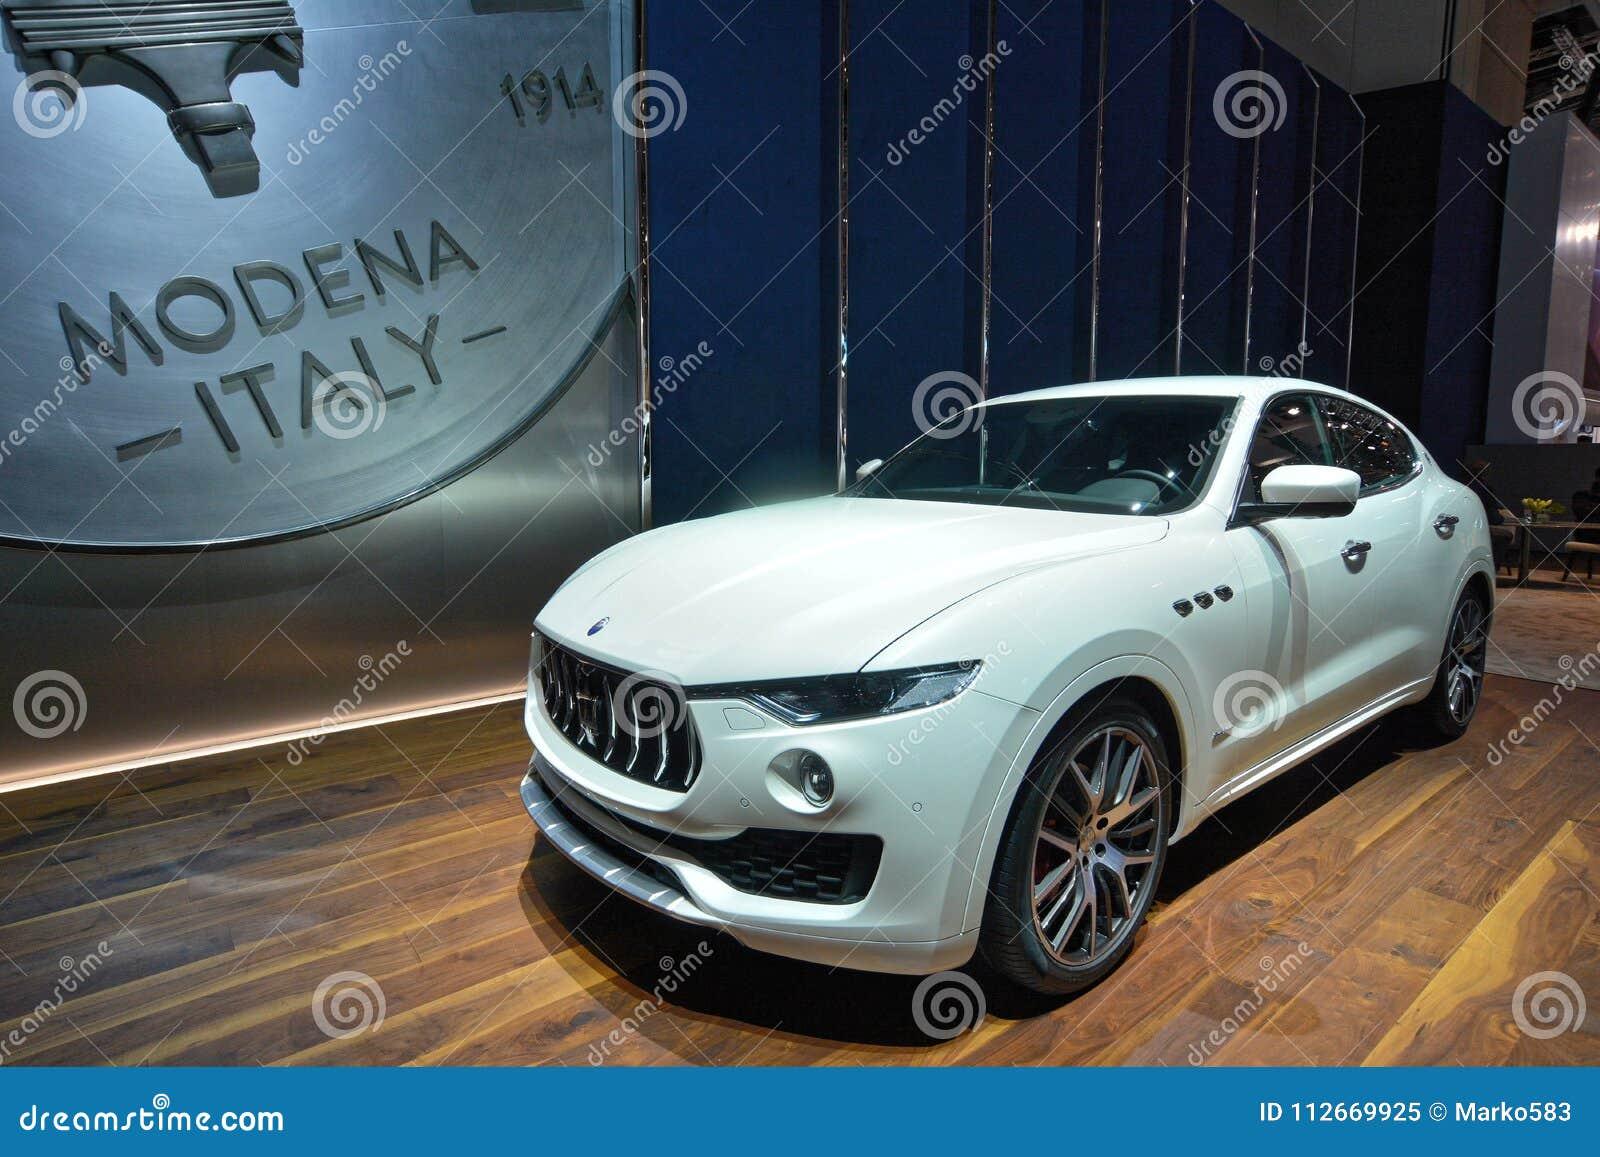 88th Geneva International Motor Show 2018 Maserati Levante Editorial Image Image Of America Built 112669925